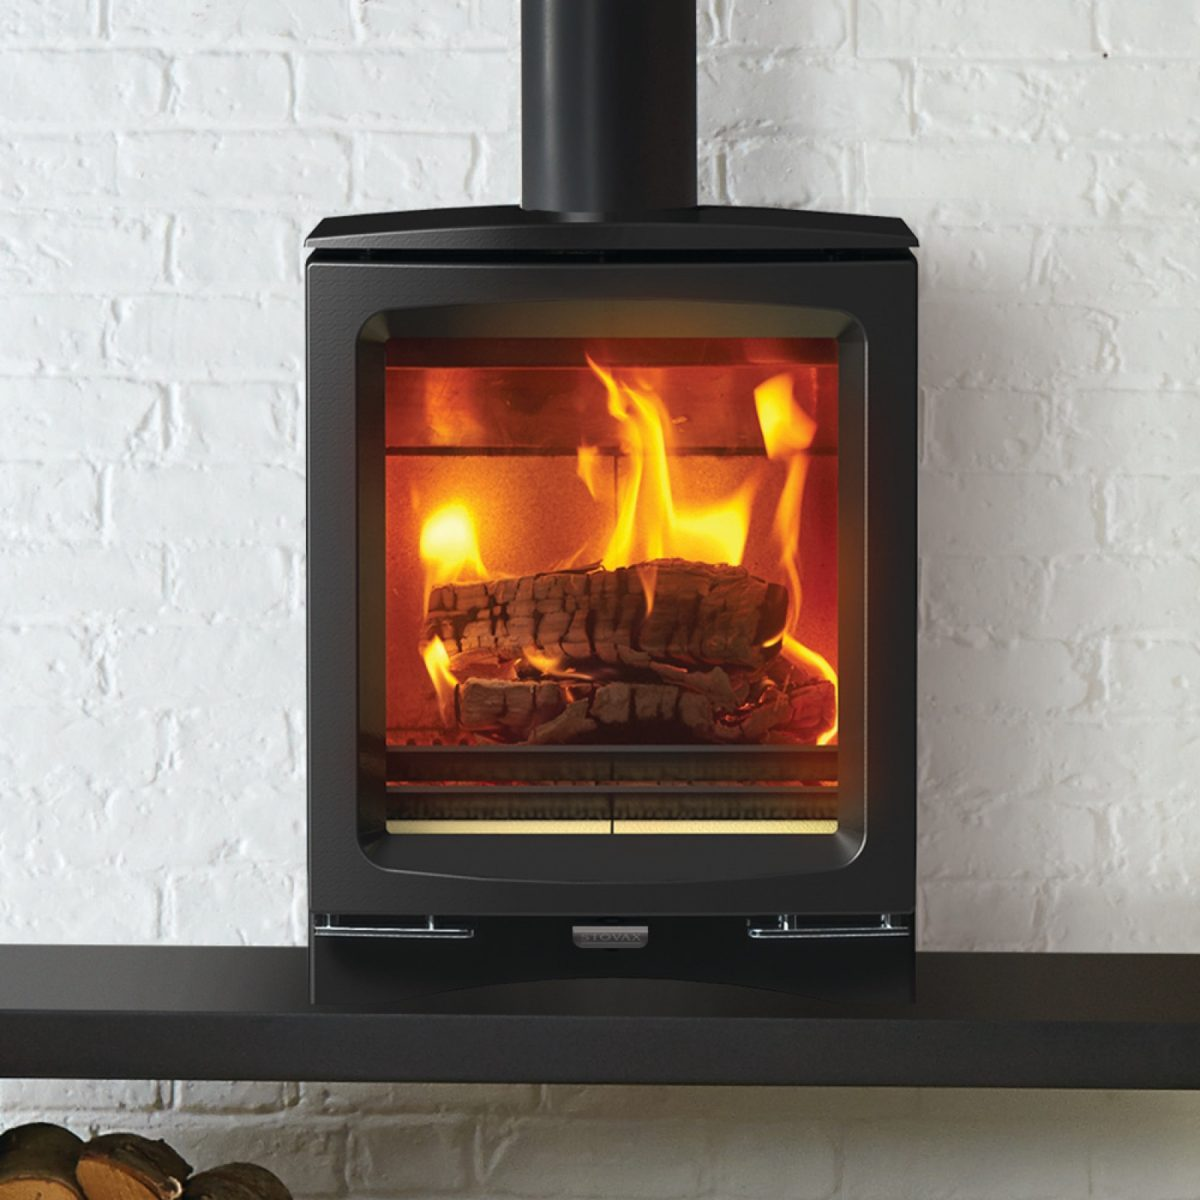 Stovax Vogue Midi Wood Burning Eco Stove With Cast Iron